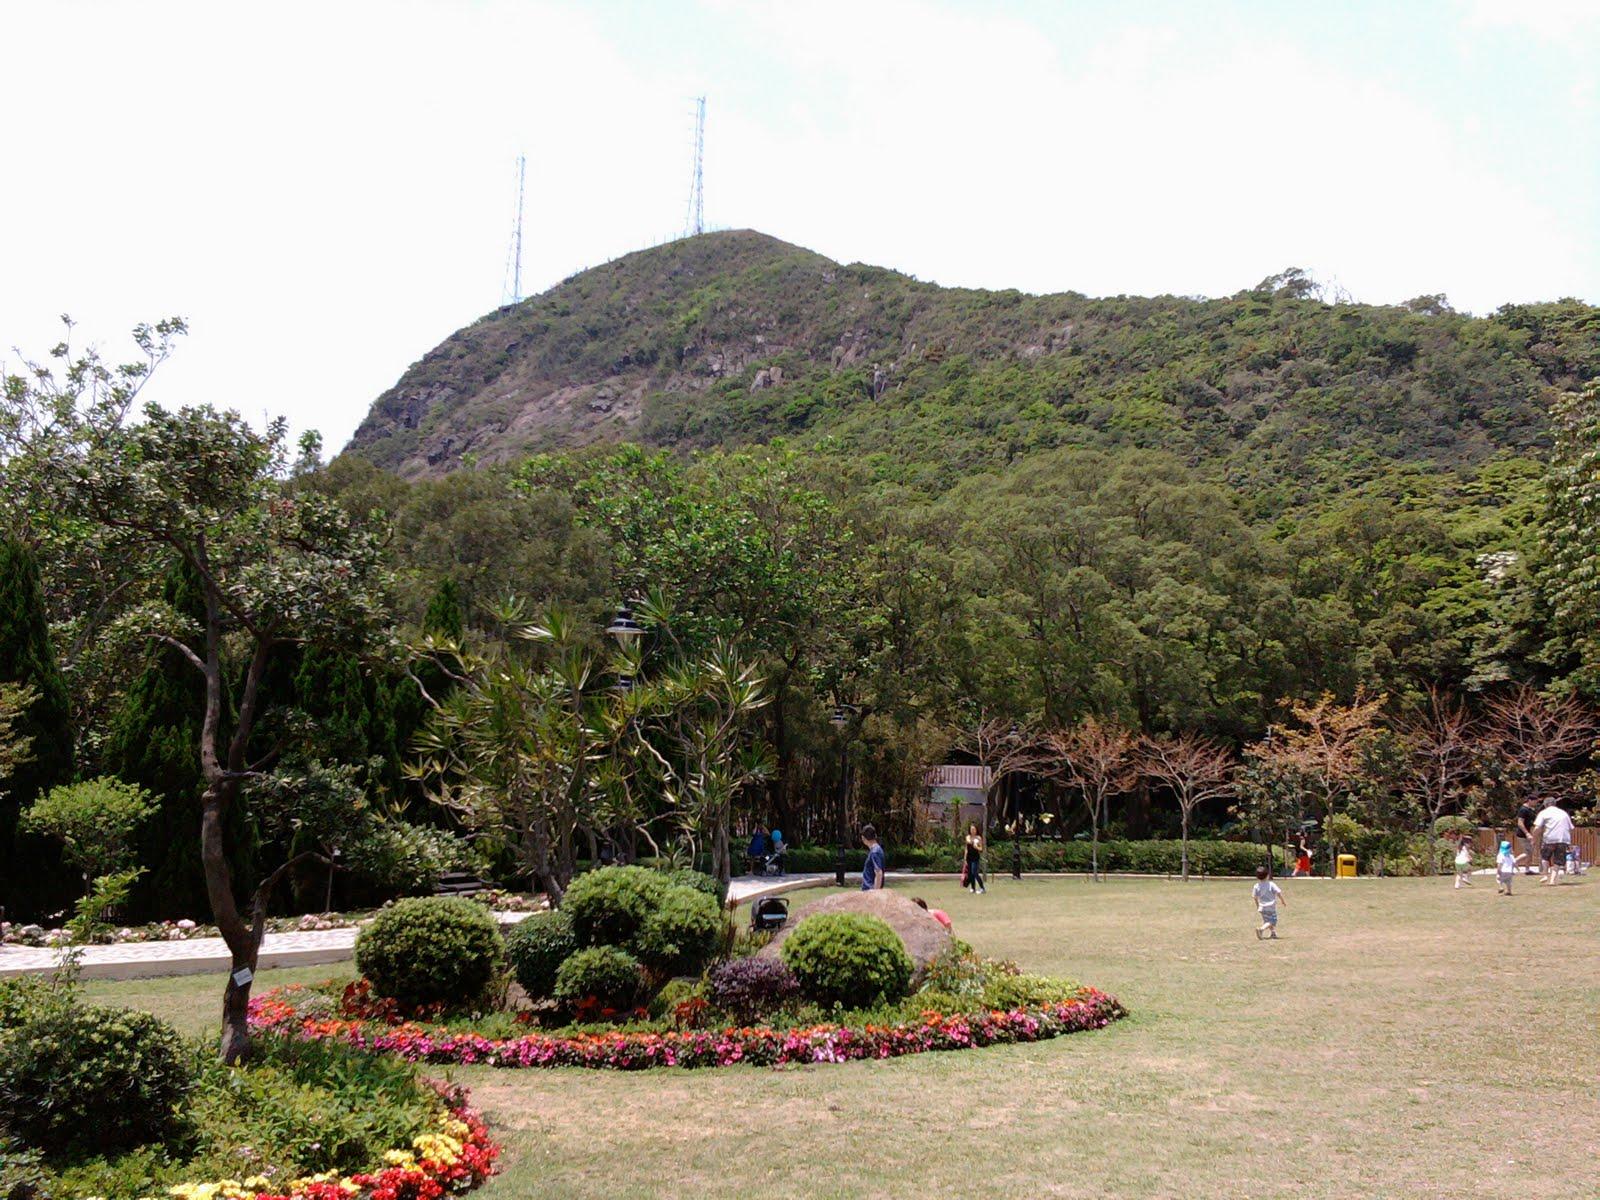 Texpat 365: HKG056: Mount Austin Park